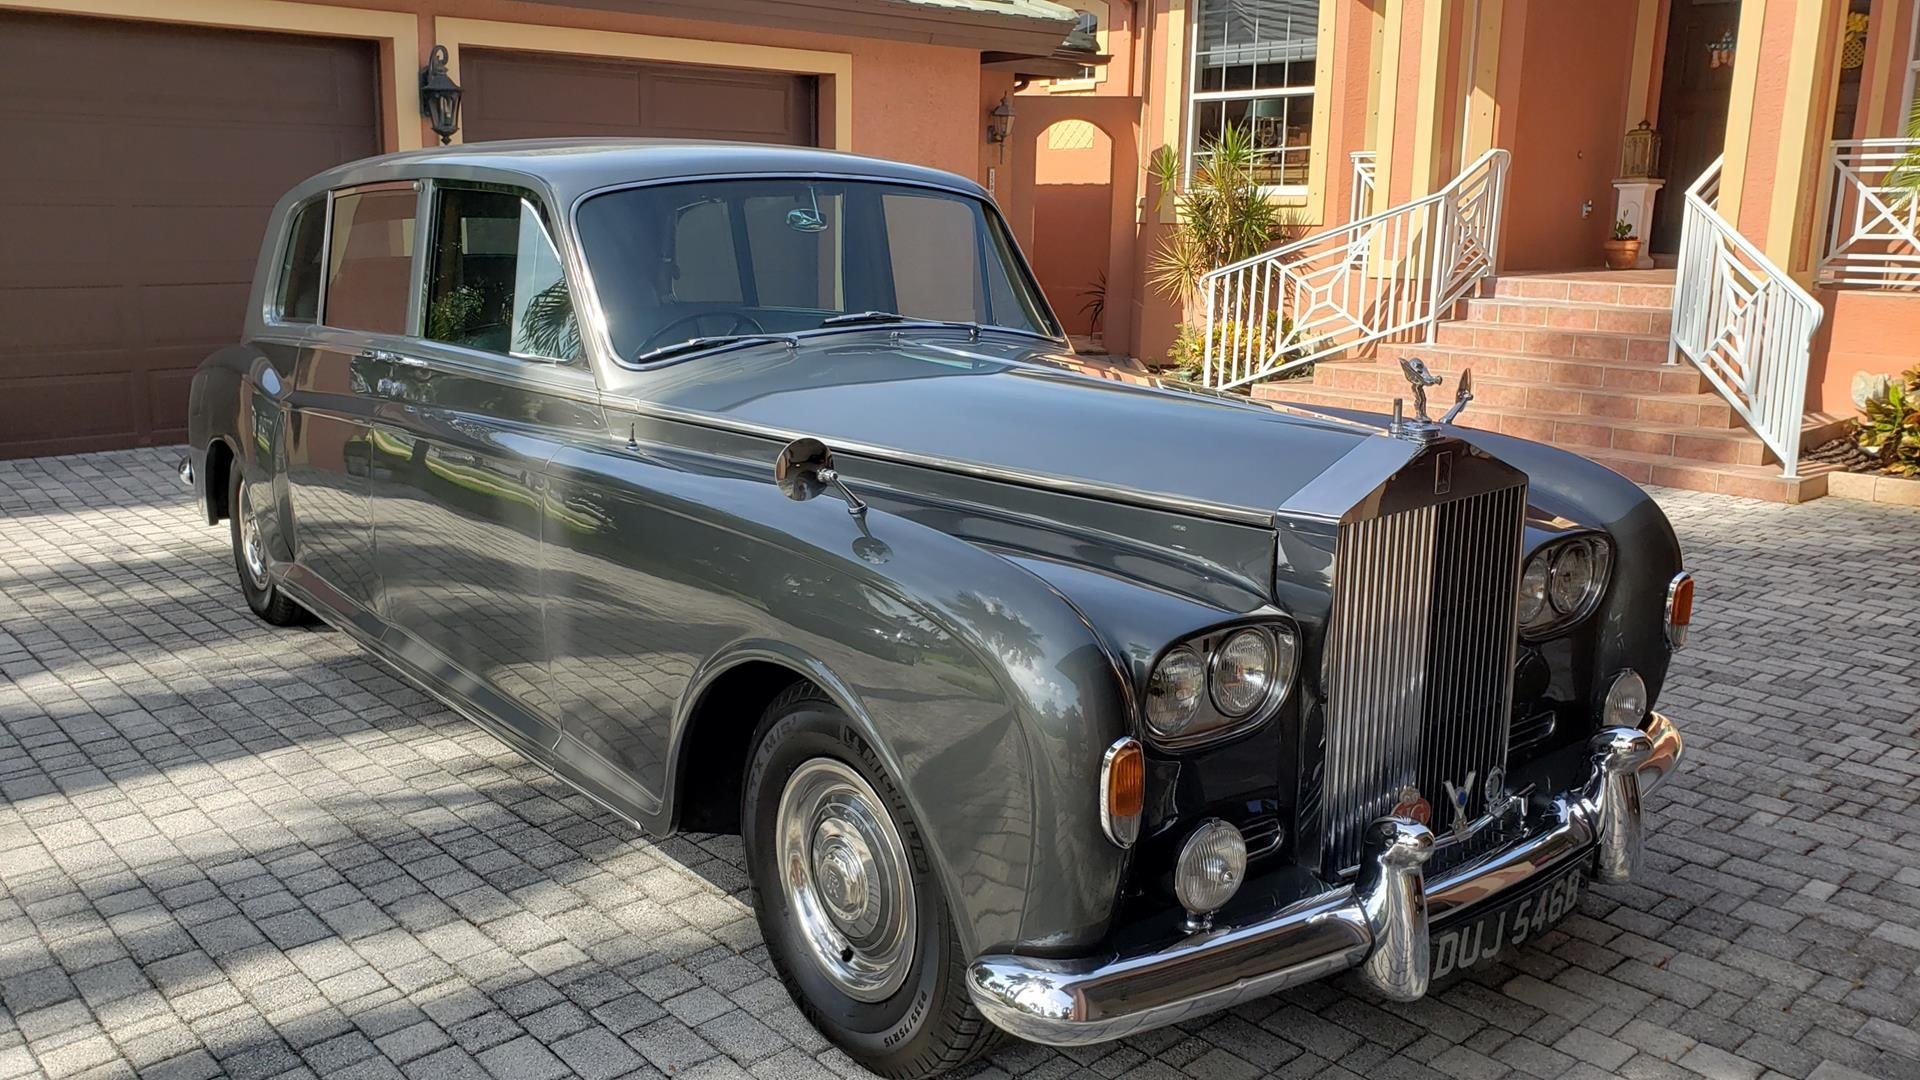 1963 Rolls Royce Phantom V RHD For Sale (picture 1 of 6)